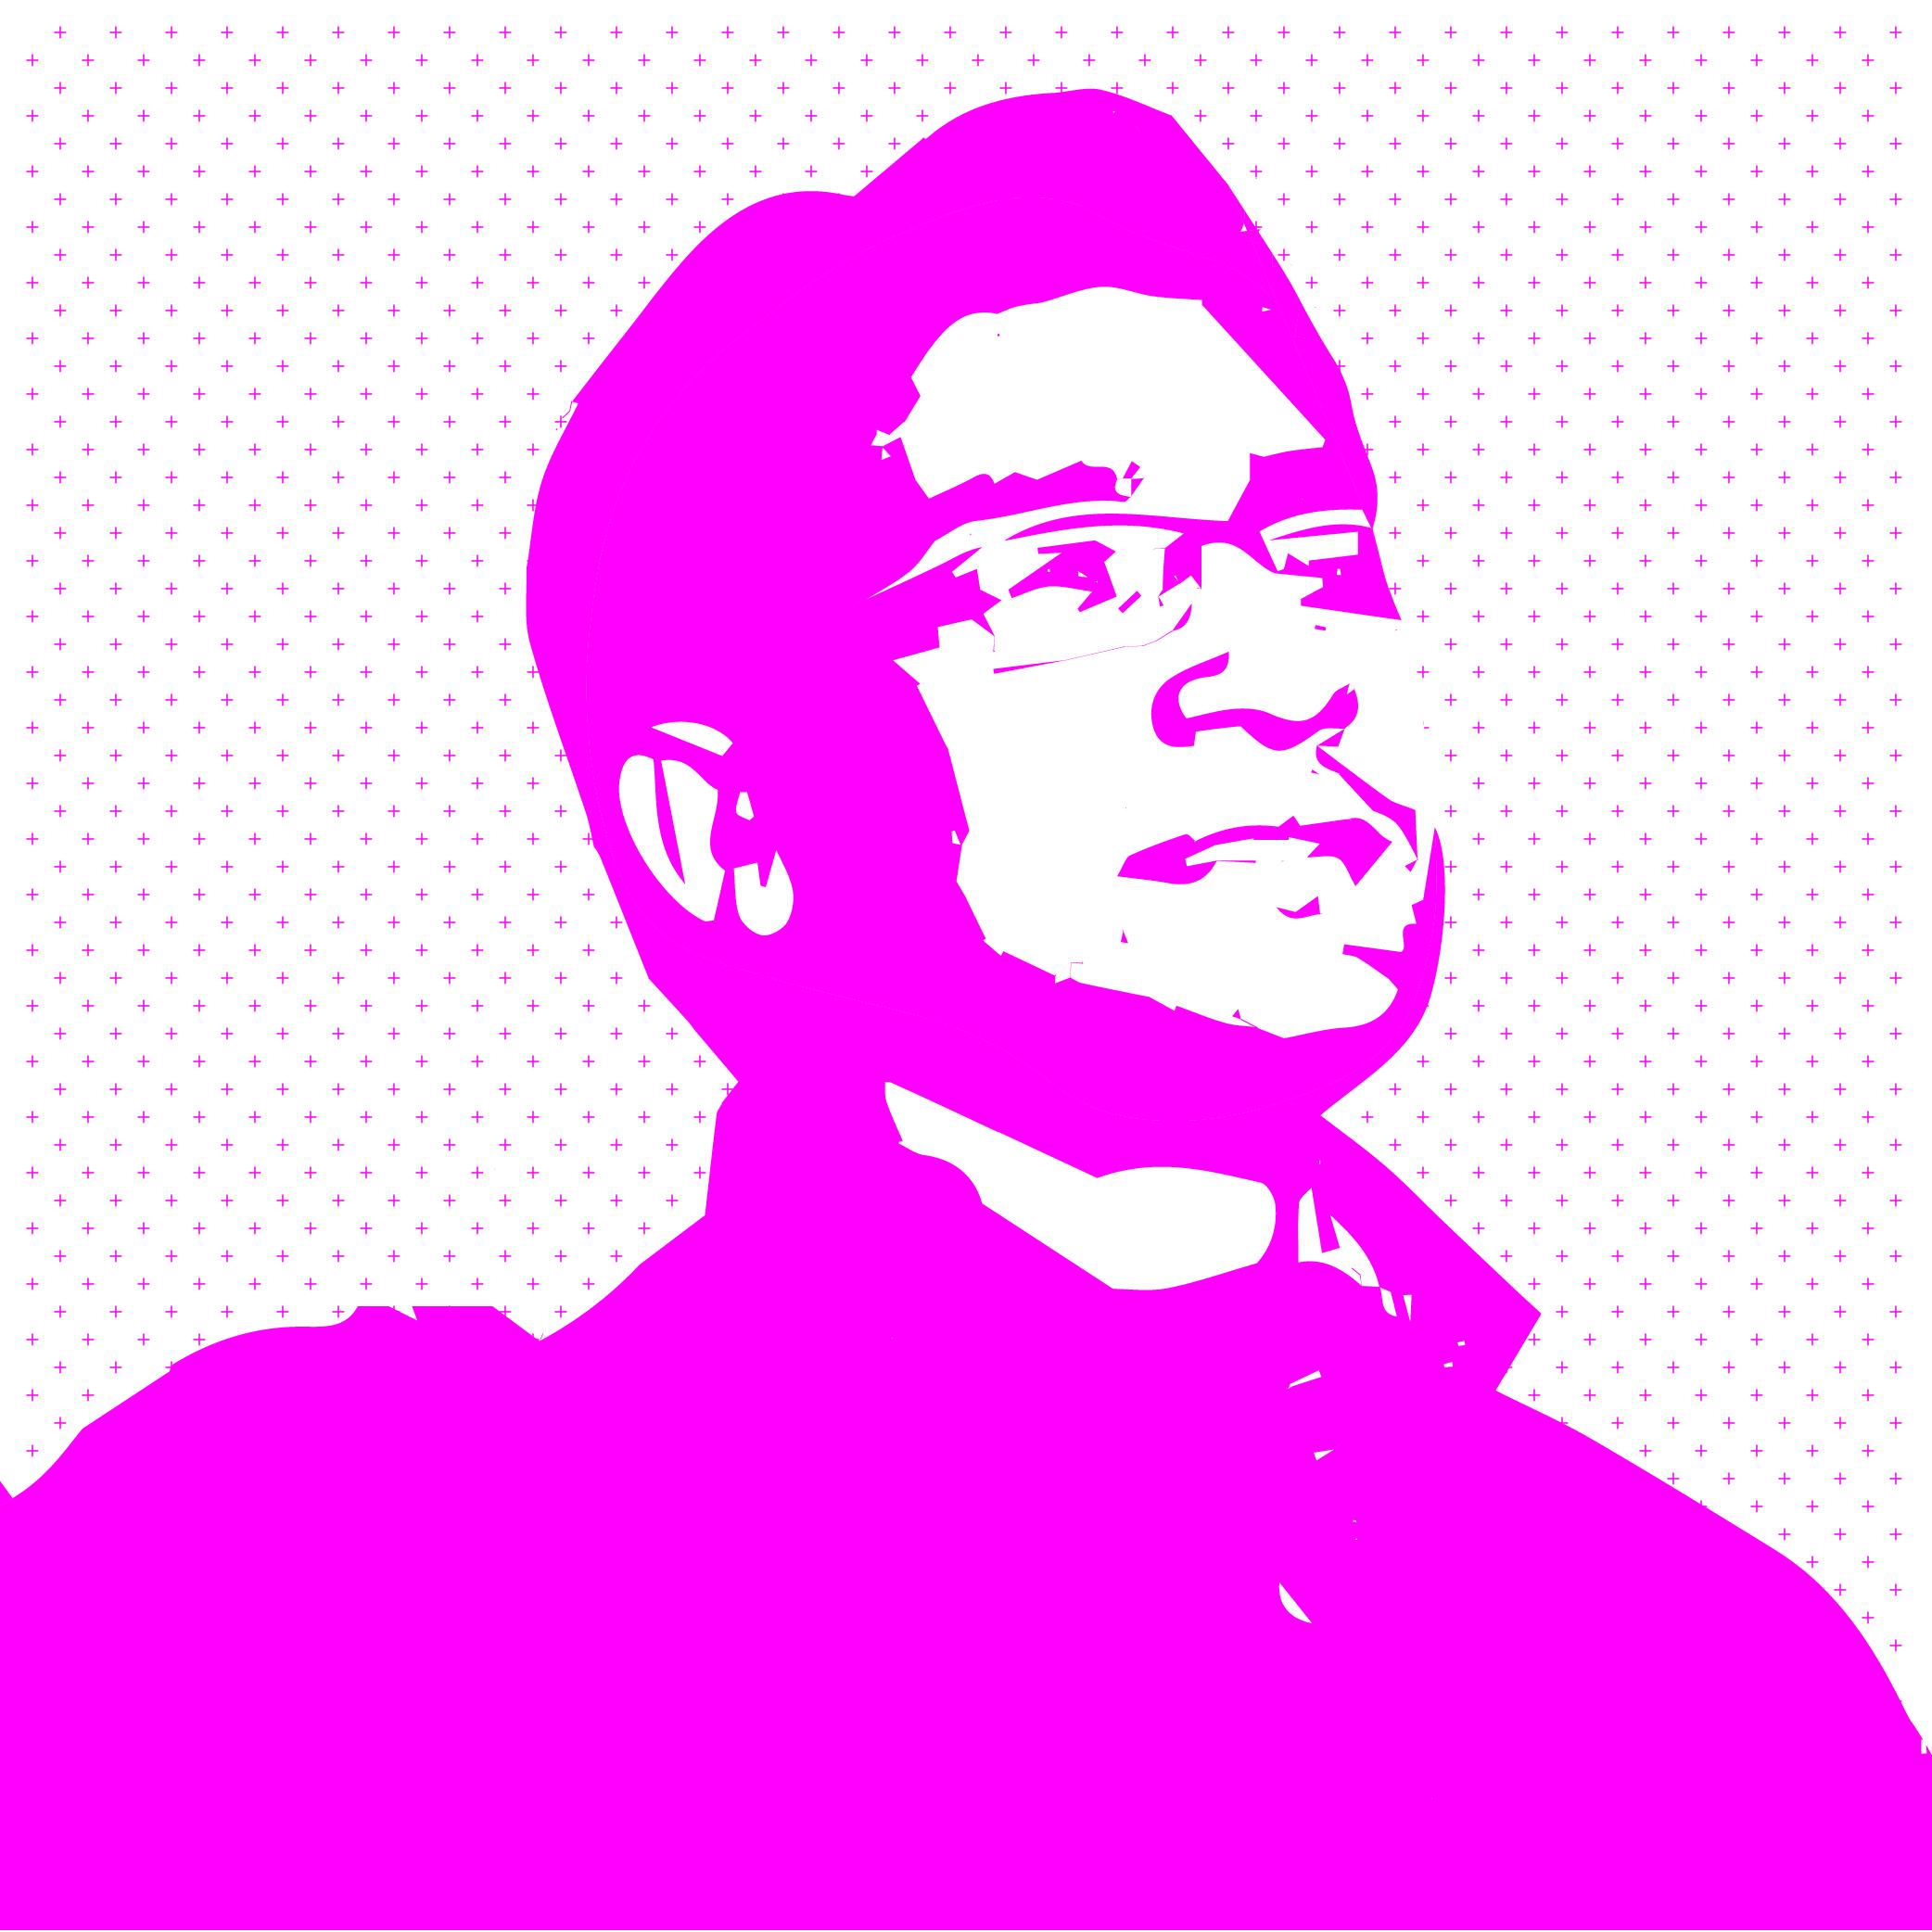 Shuva Chowdury - PhD Candidate VUW, since 2015